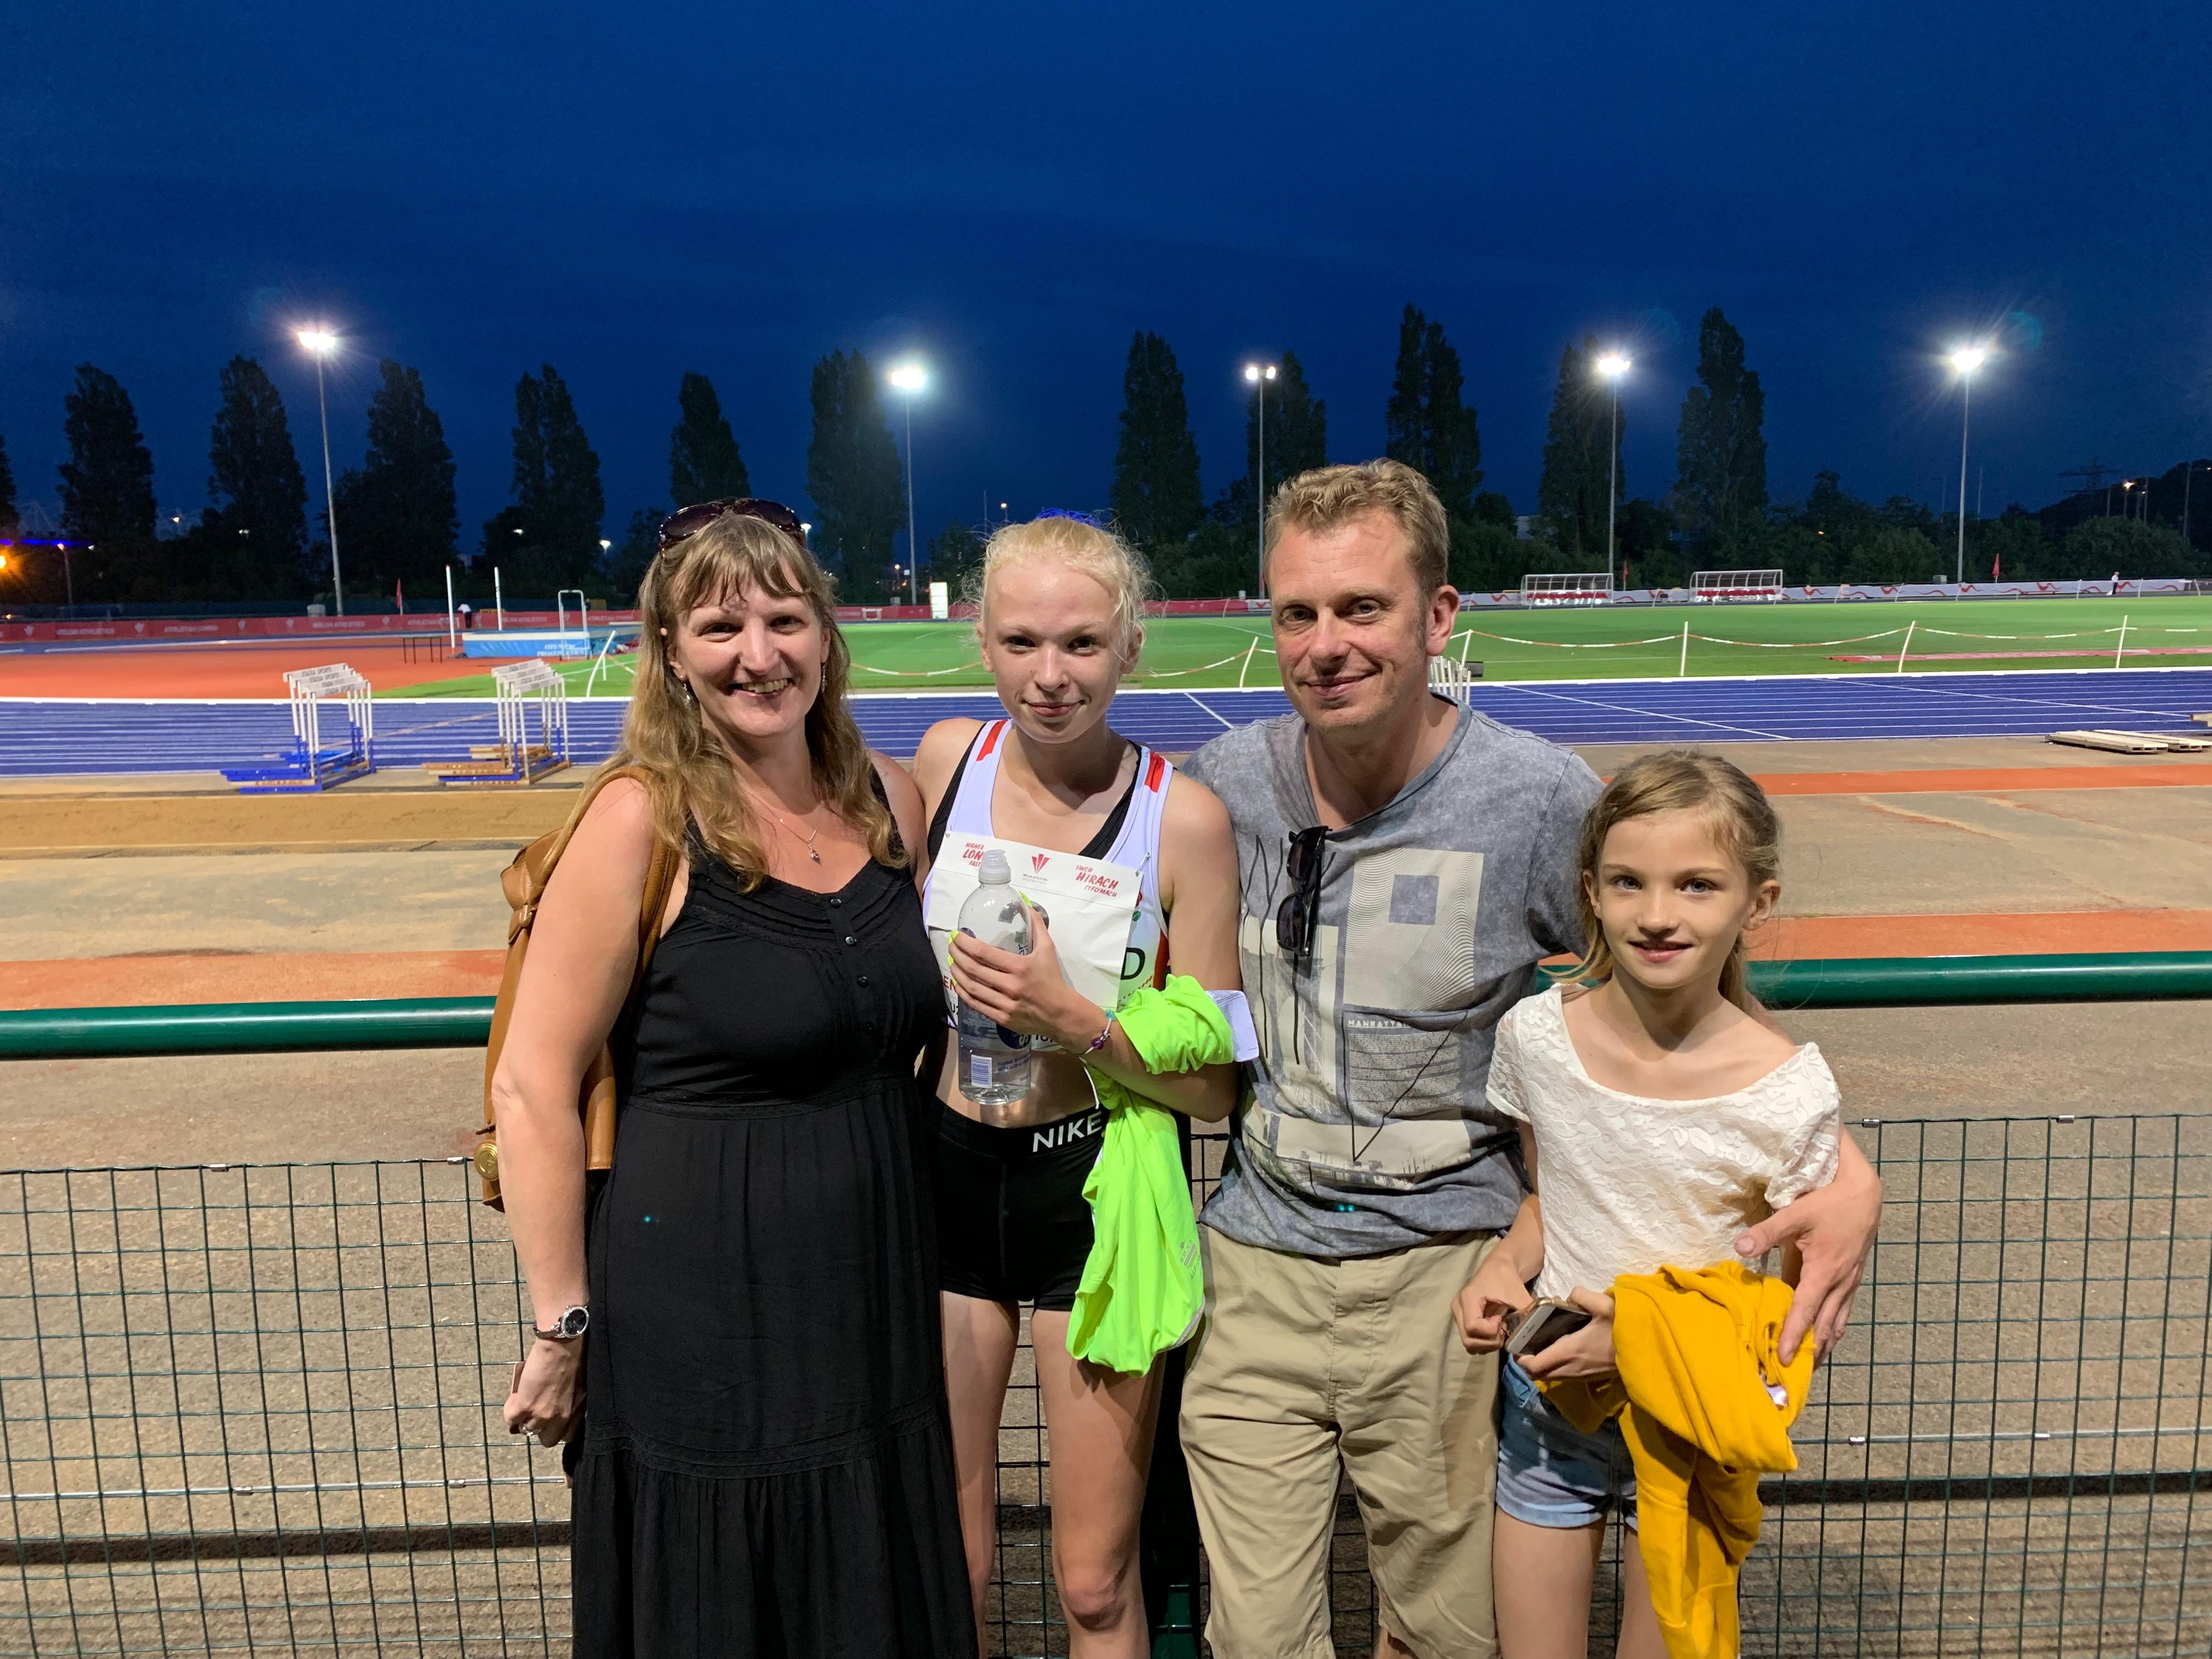 Elizabeth Clarkson races to big PB representing England – 24/7/2019